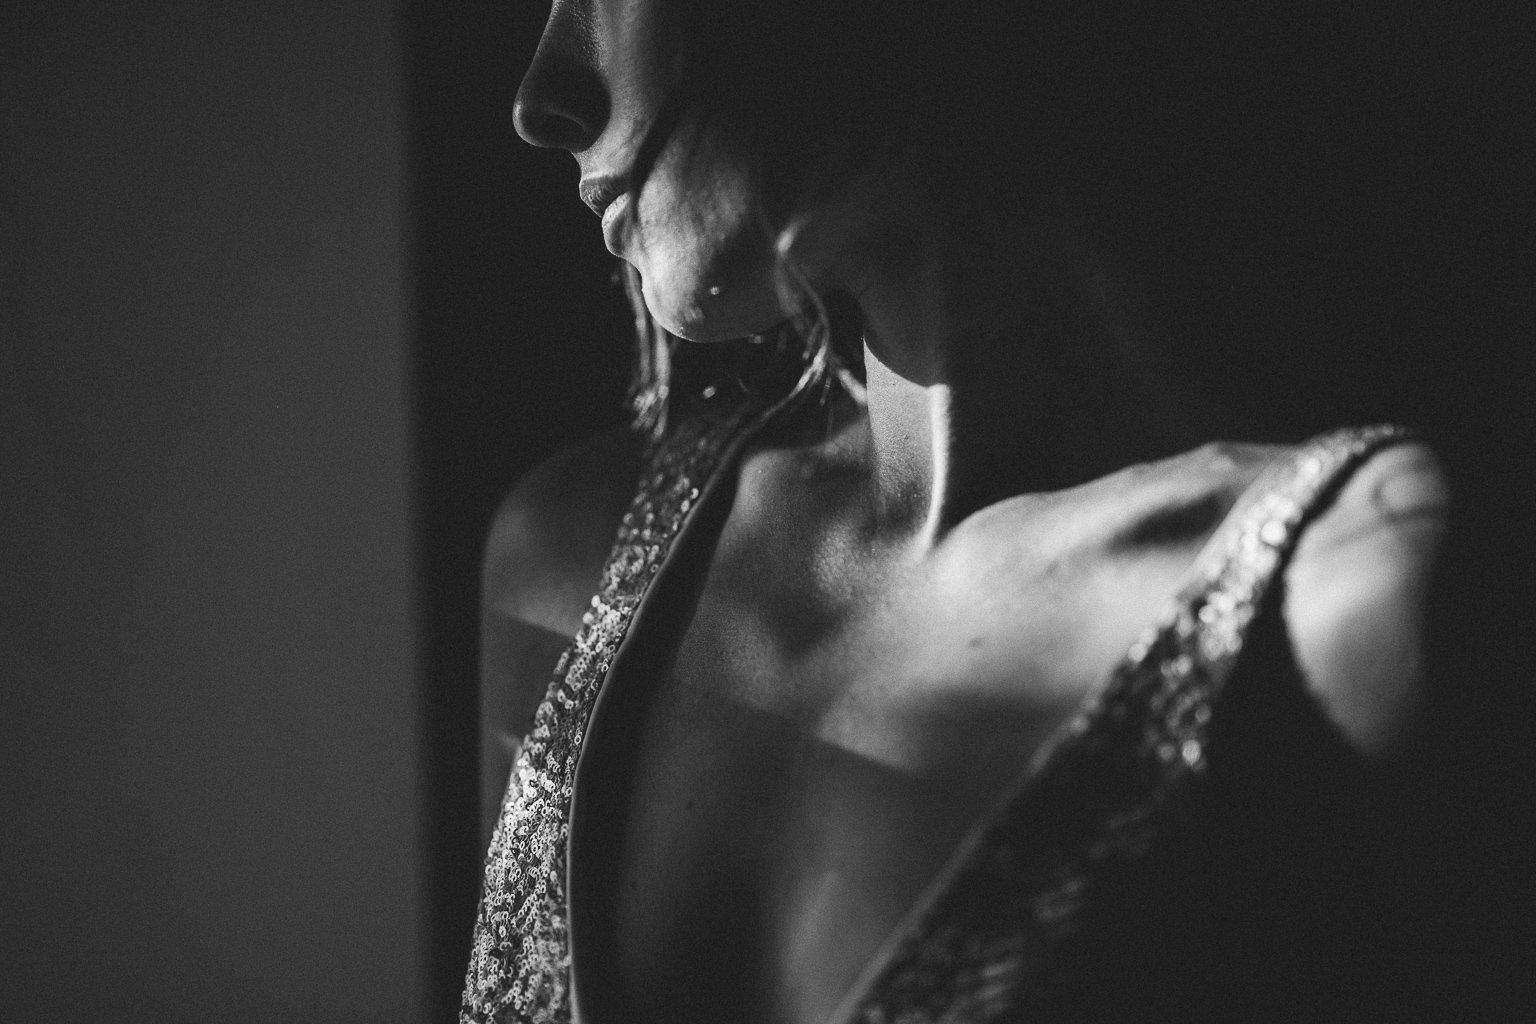 photographe-mariage-annecy-anne-ucla-photographe-7